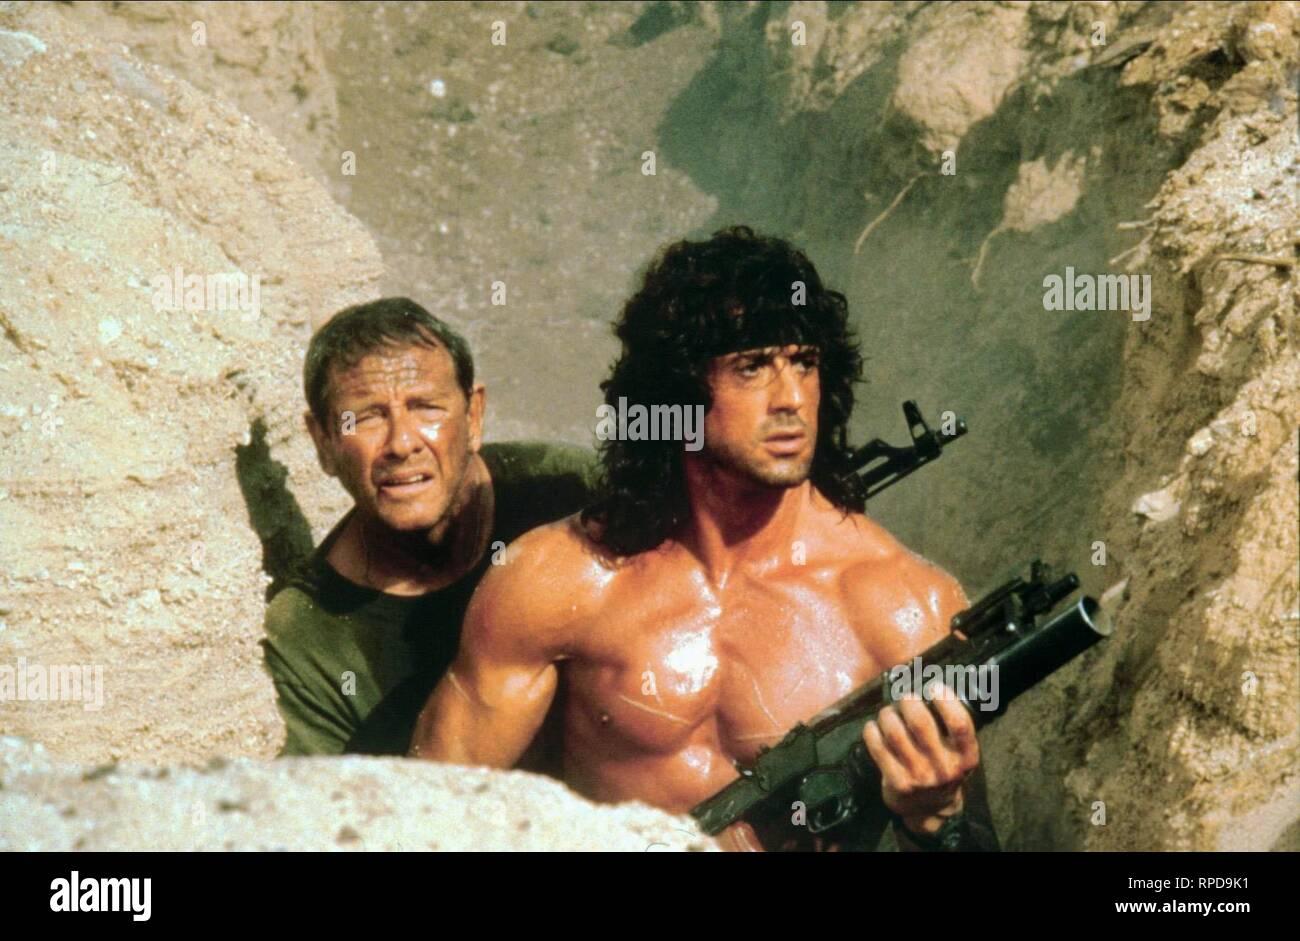 Rambo Iii High Resolution Stock Photography And Images Alamy